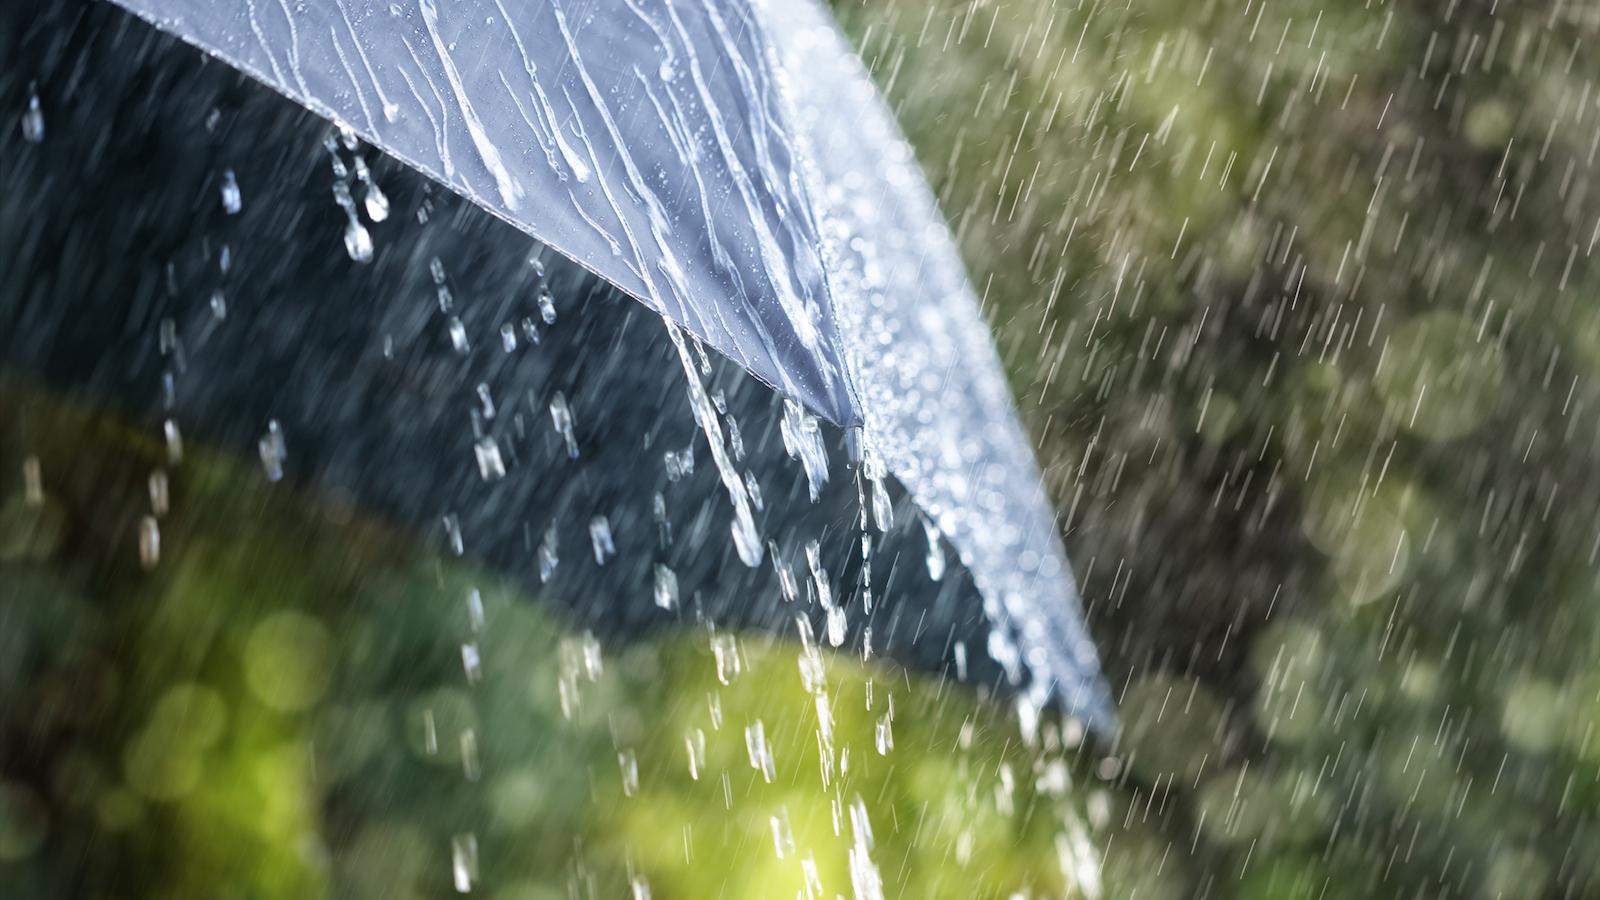 rain-umbrella20181214101704